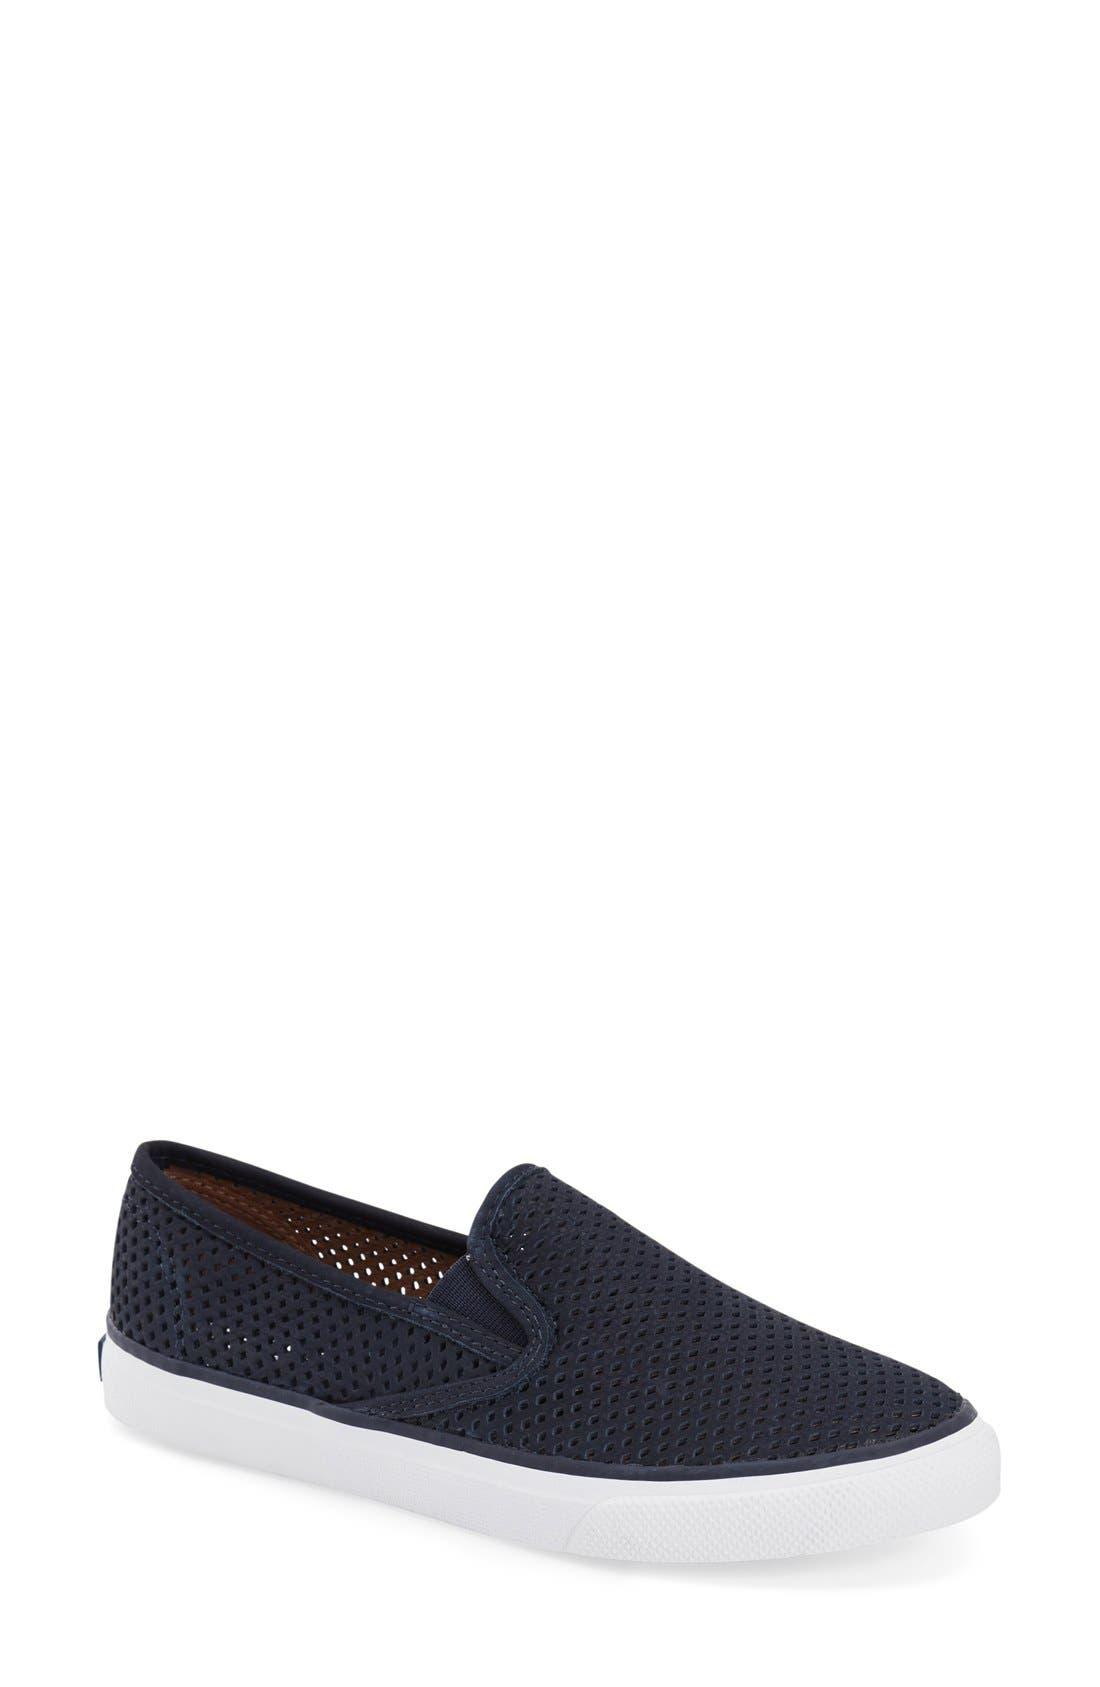 Alternate Image 1 Selected - Sperry 'Seaside' Perforated Slip-On Sneaker (Women)